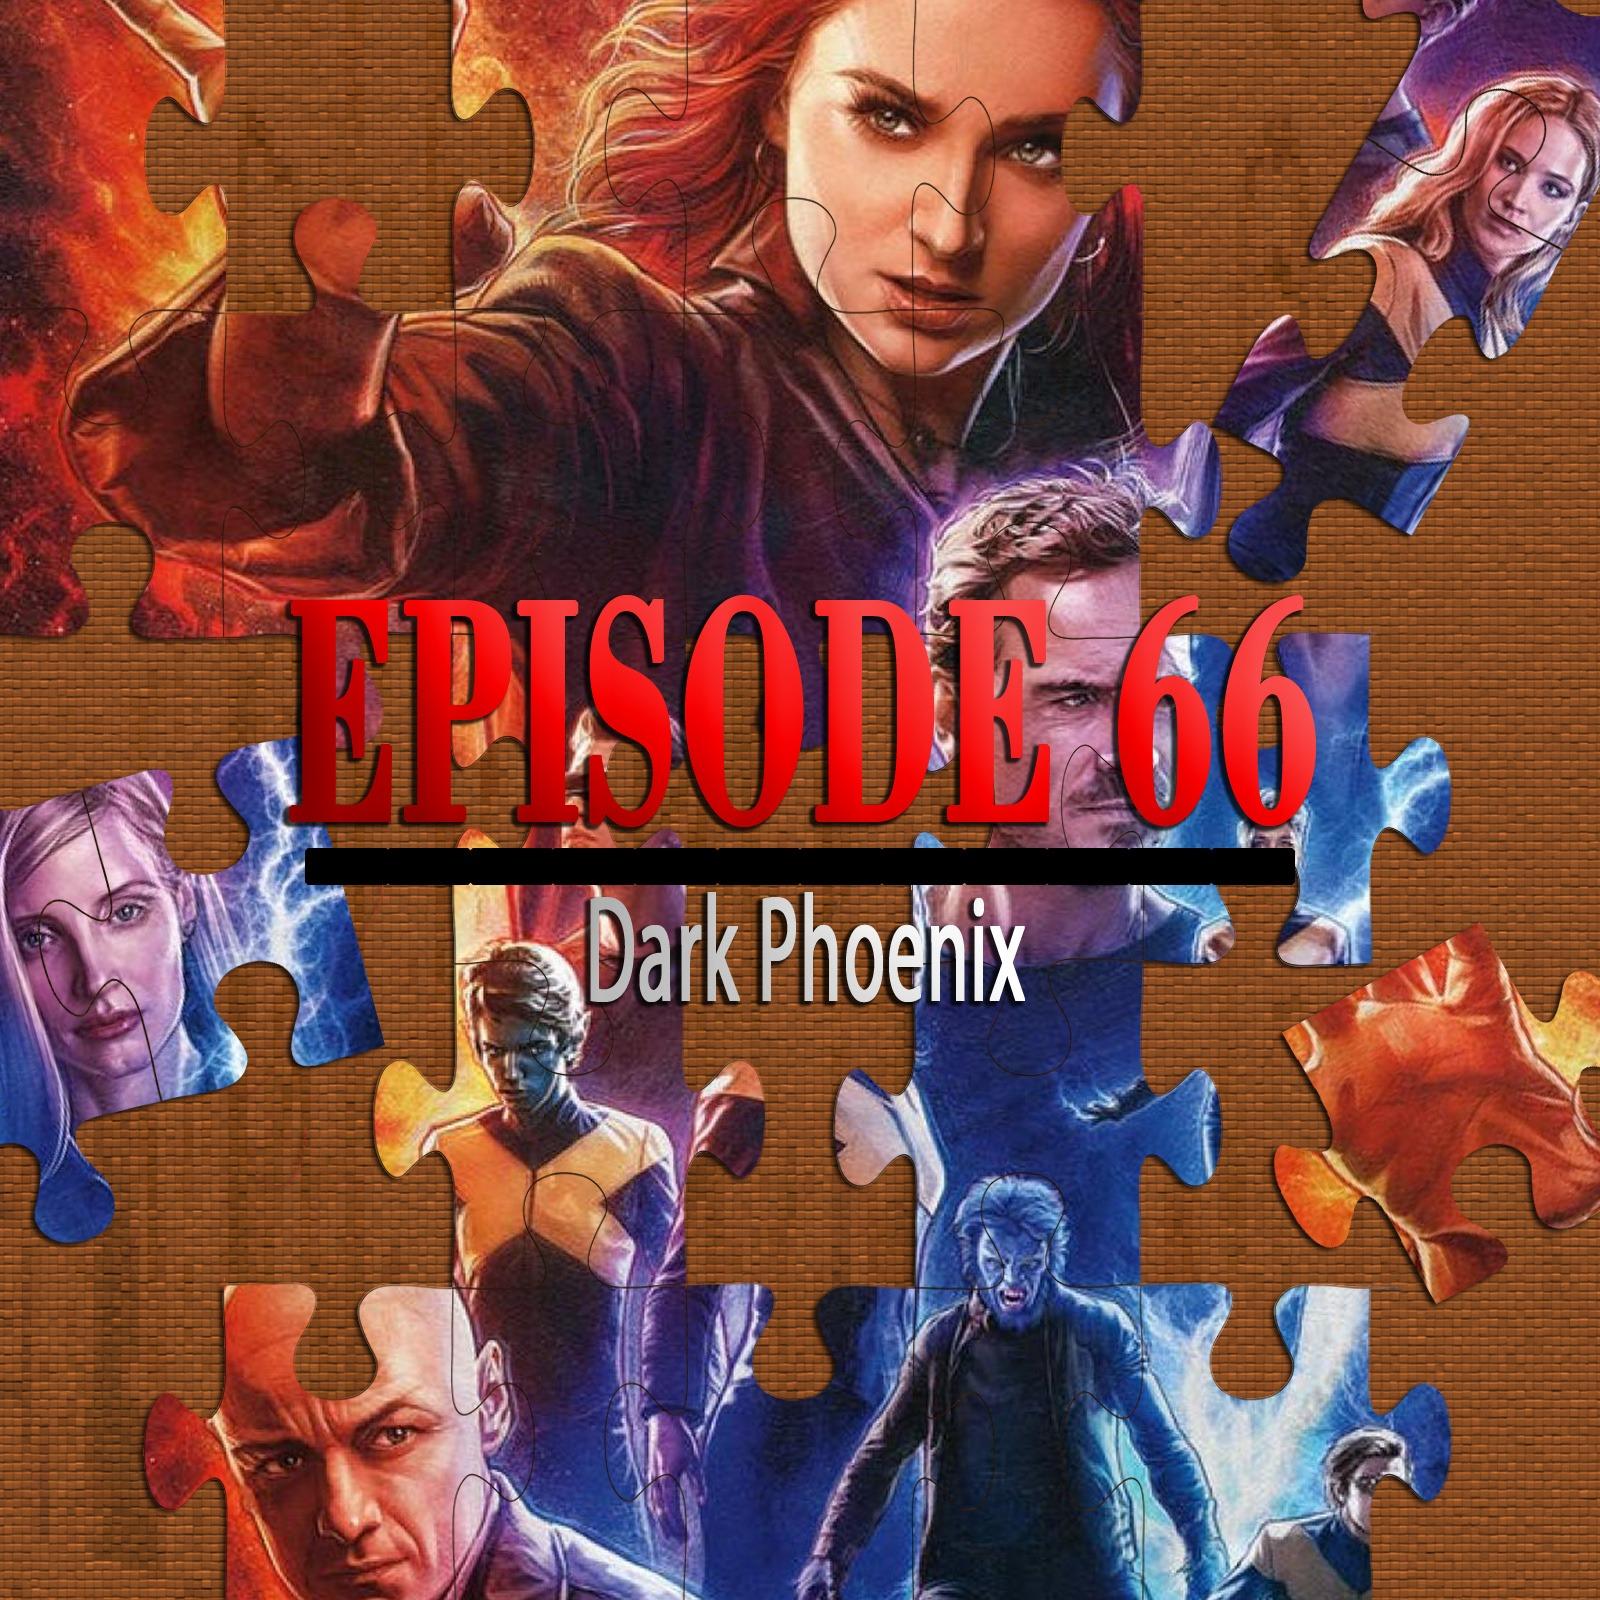 Dark Phoenix (Featuring Susannah Lewis)